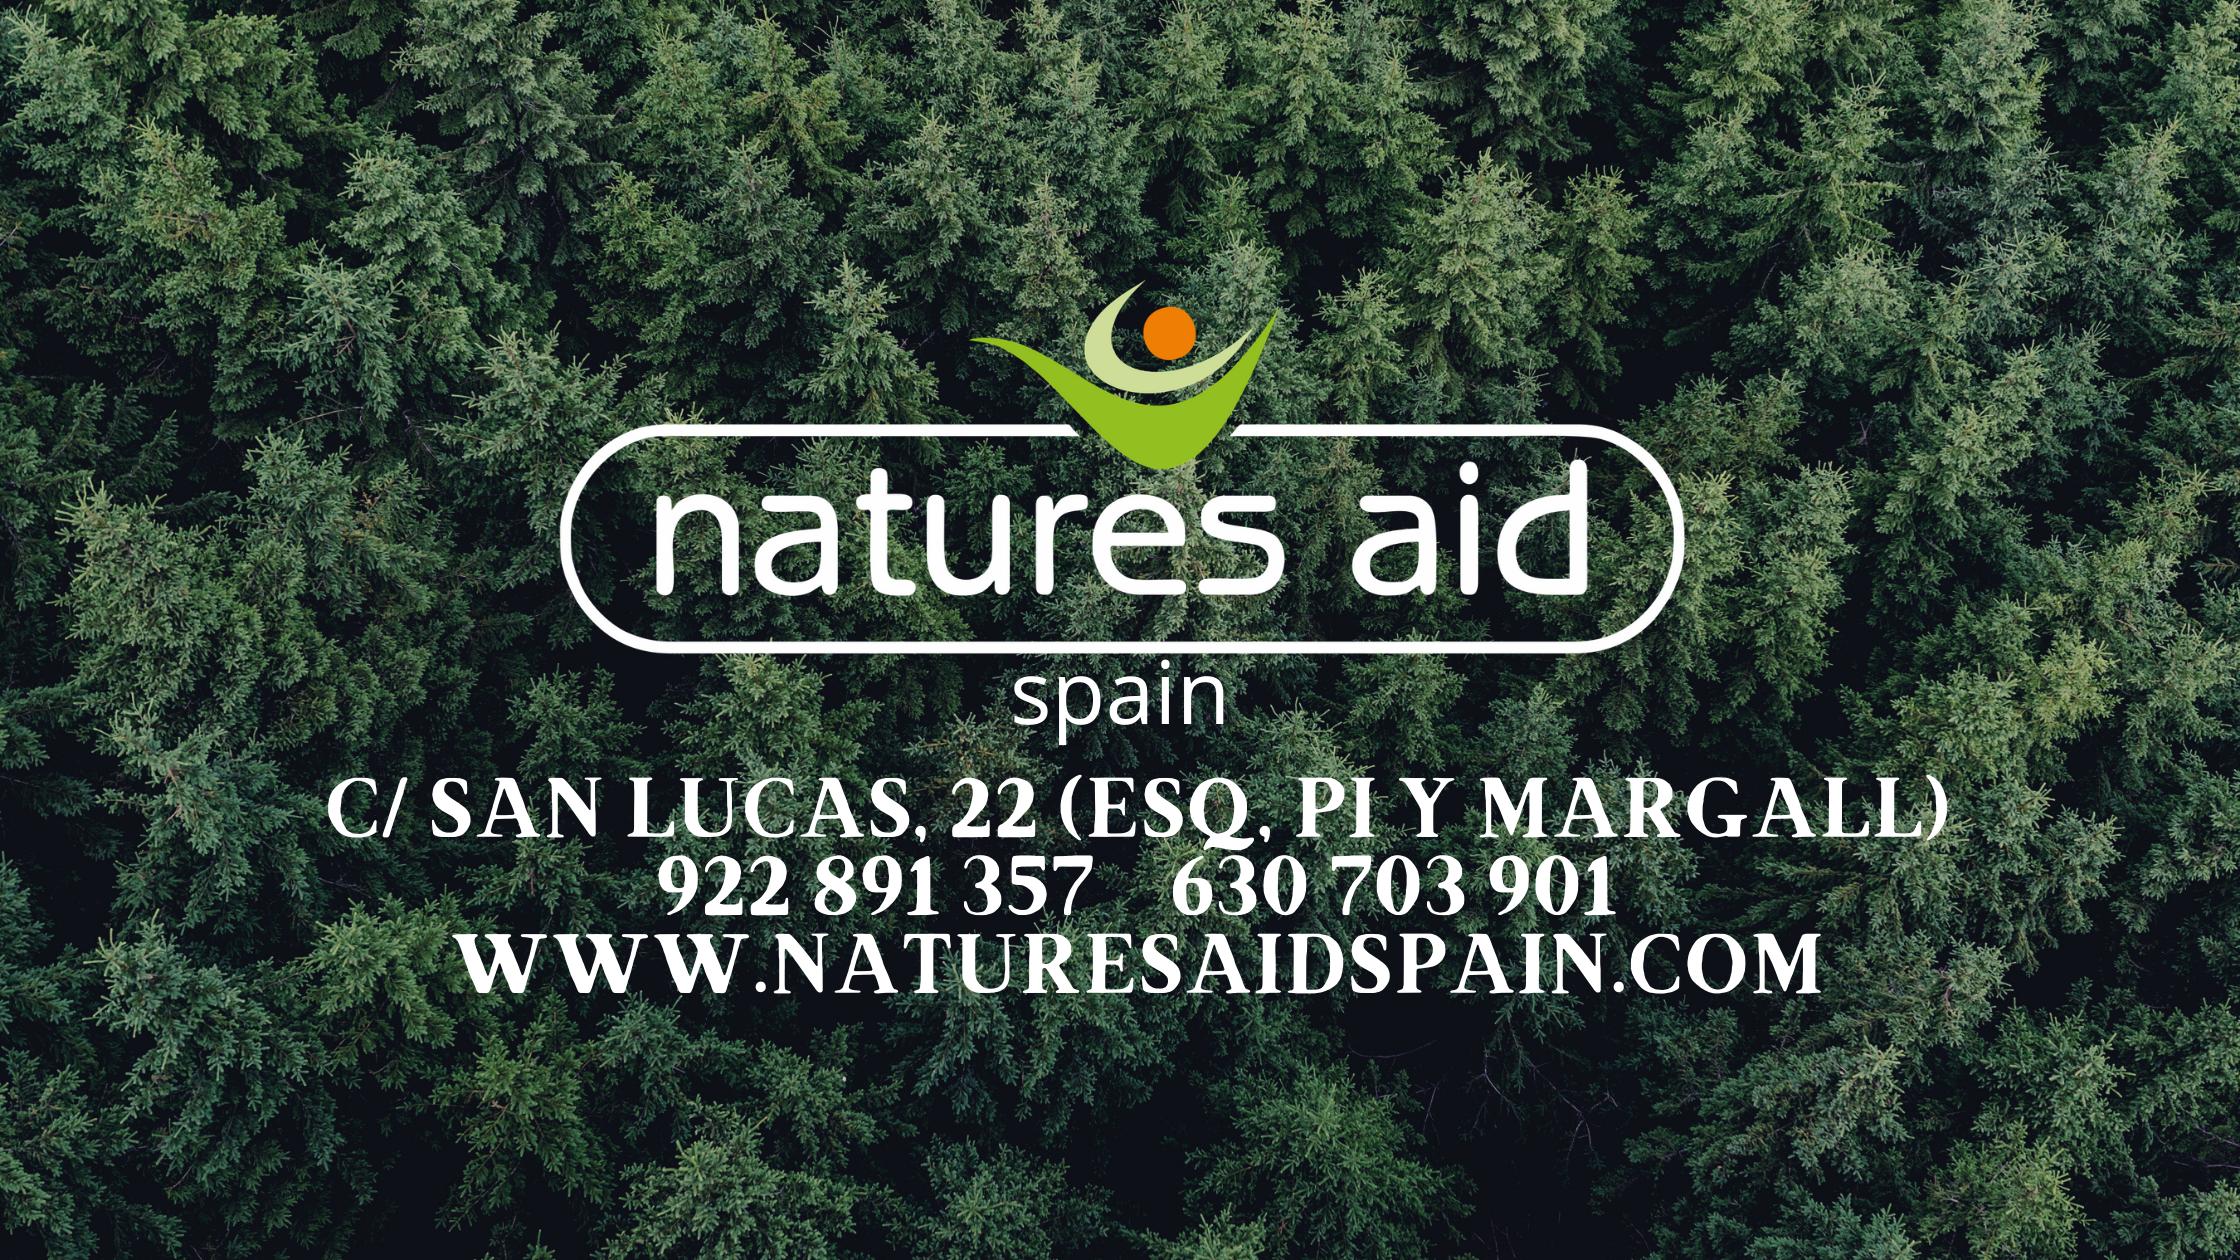 NATURES AID SPAIN